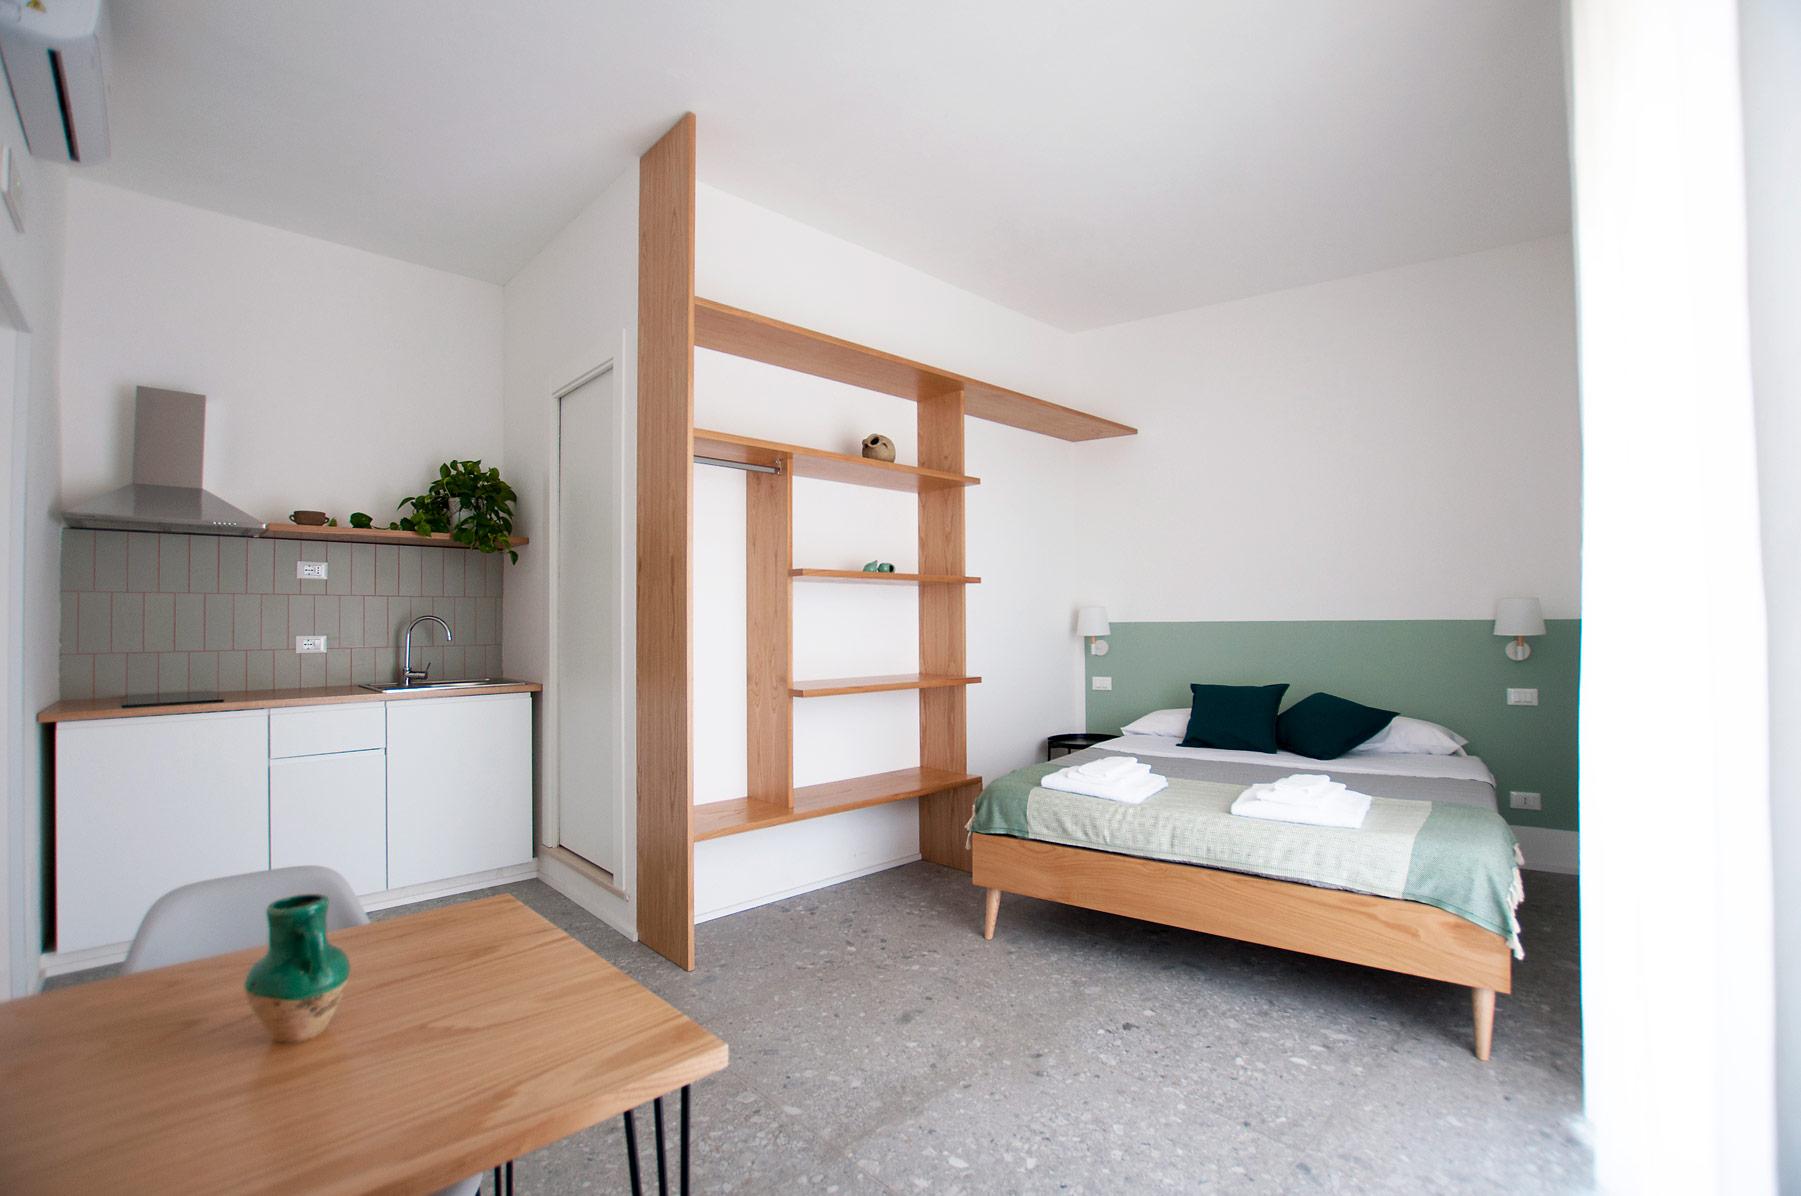 monolocale-casa27-b&b-terracina